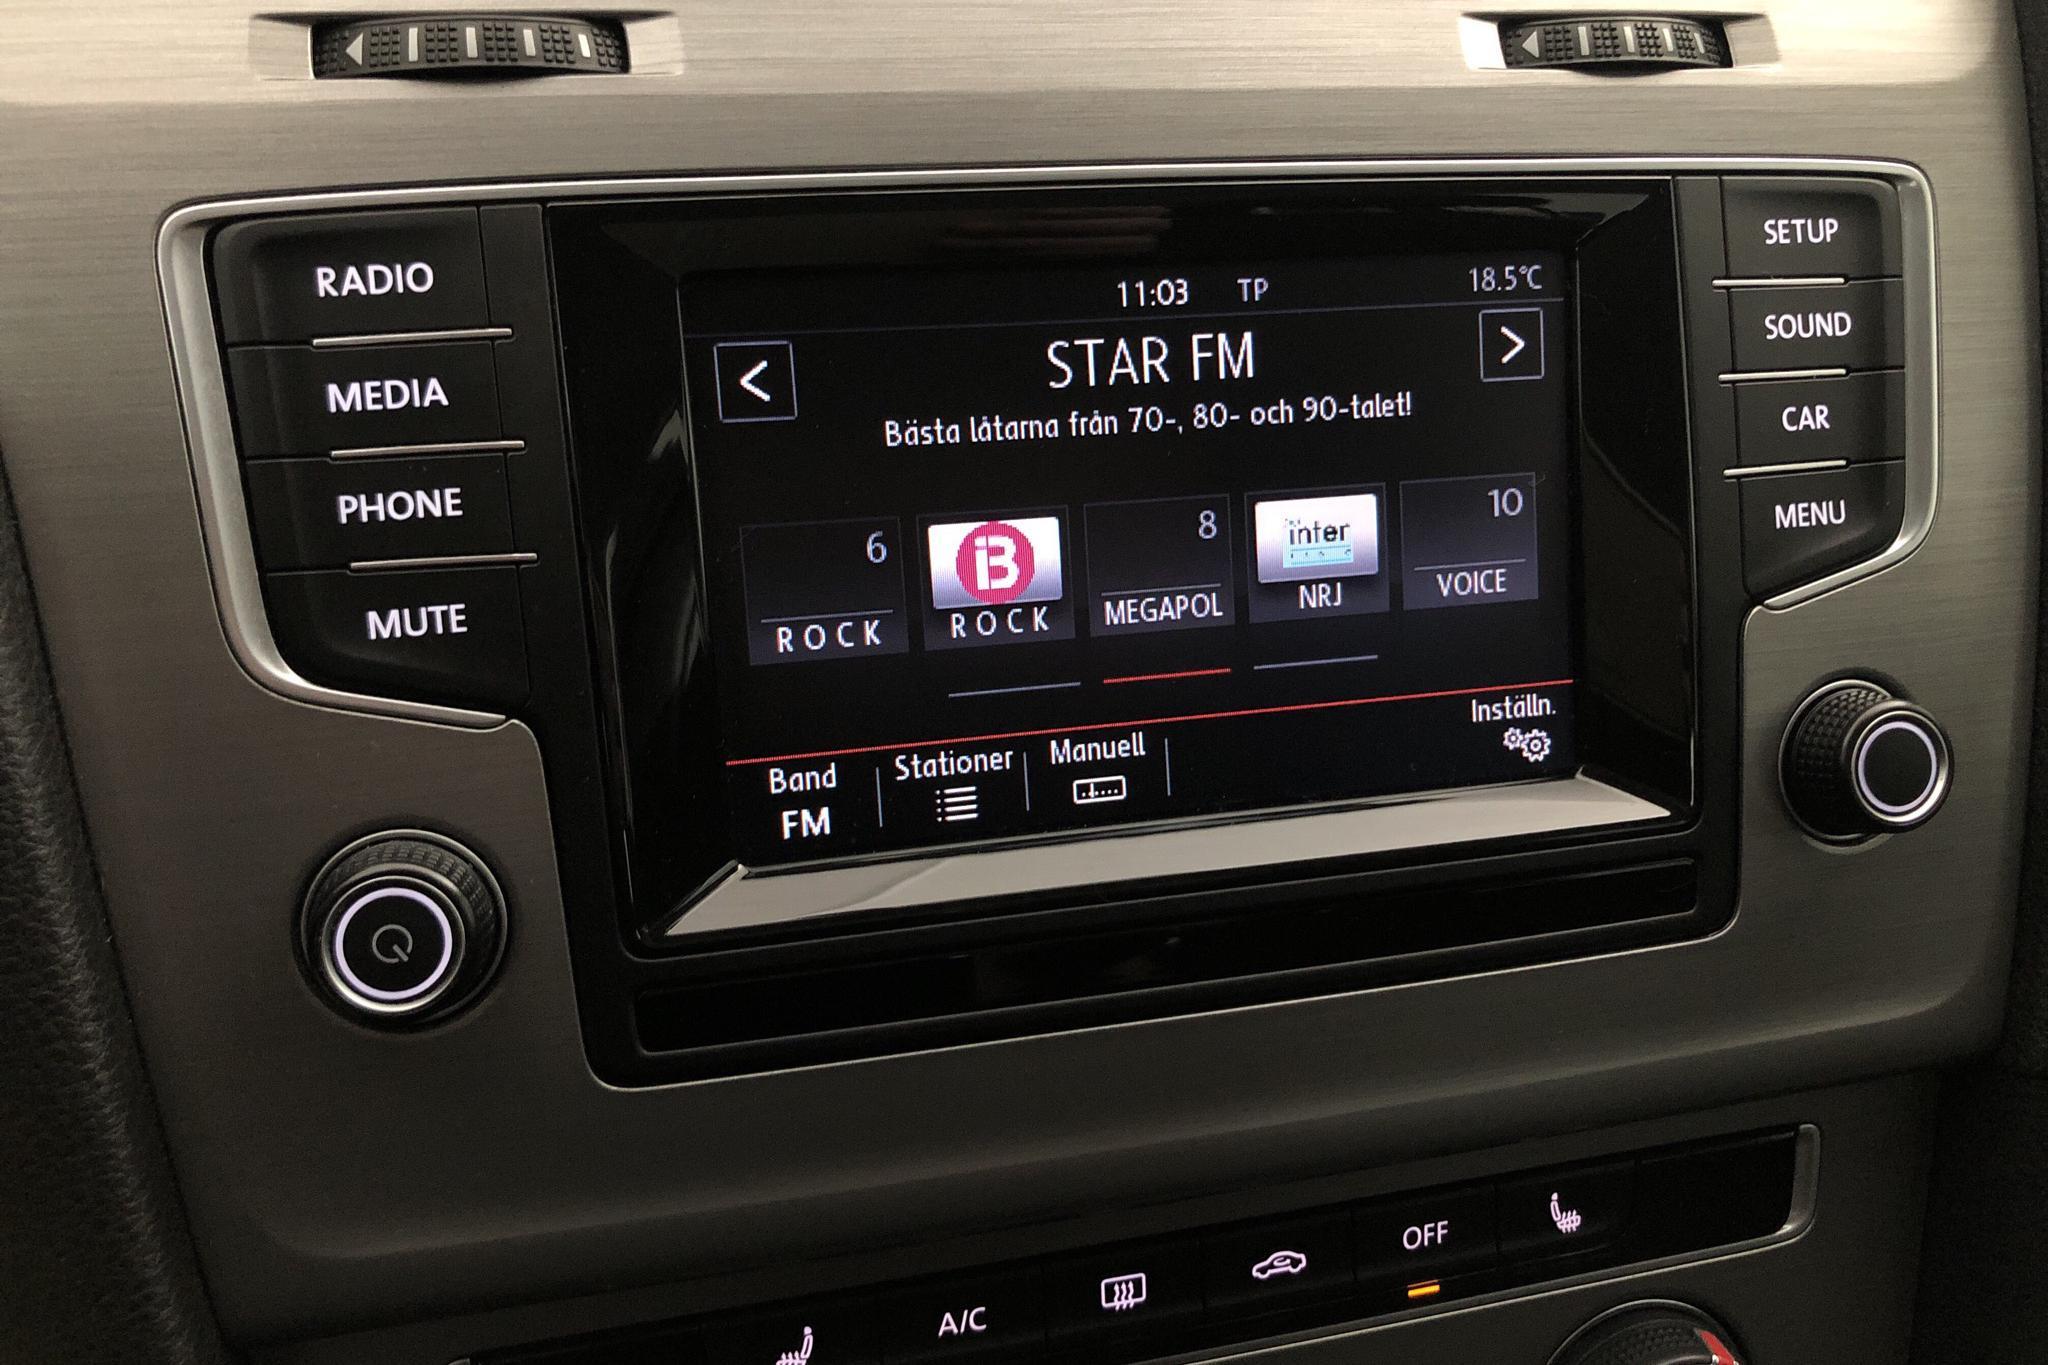 VW Golf VII 1.2 TSI 5dr (105hk) - 10 251 mil - Manuell - silver - 2015